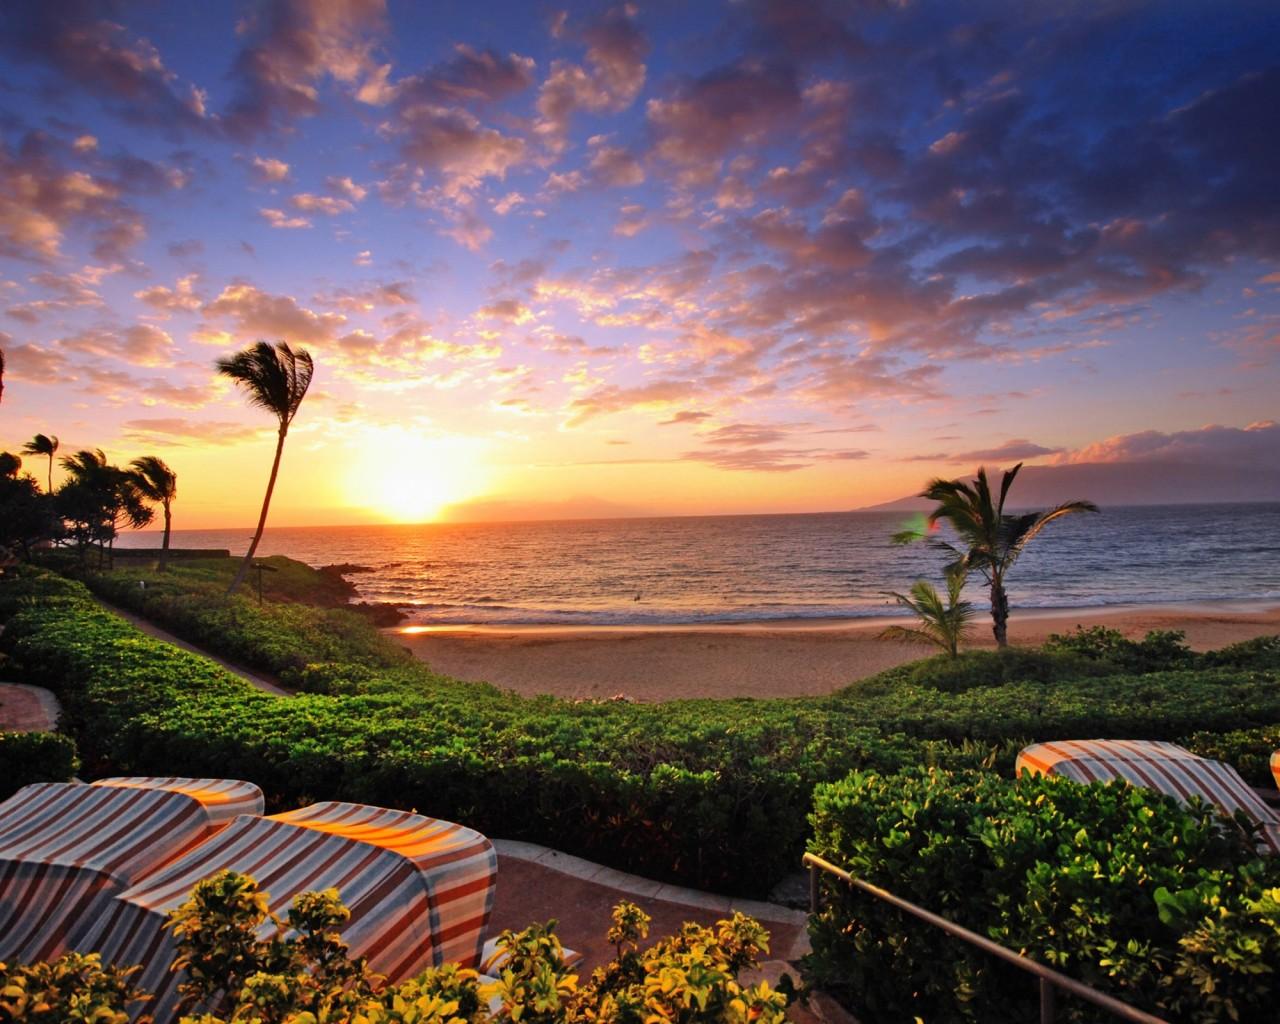 Hawaii Sunset Desktop Backgrounds Related Keywords 1280x1024